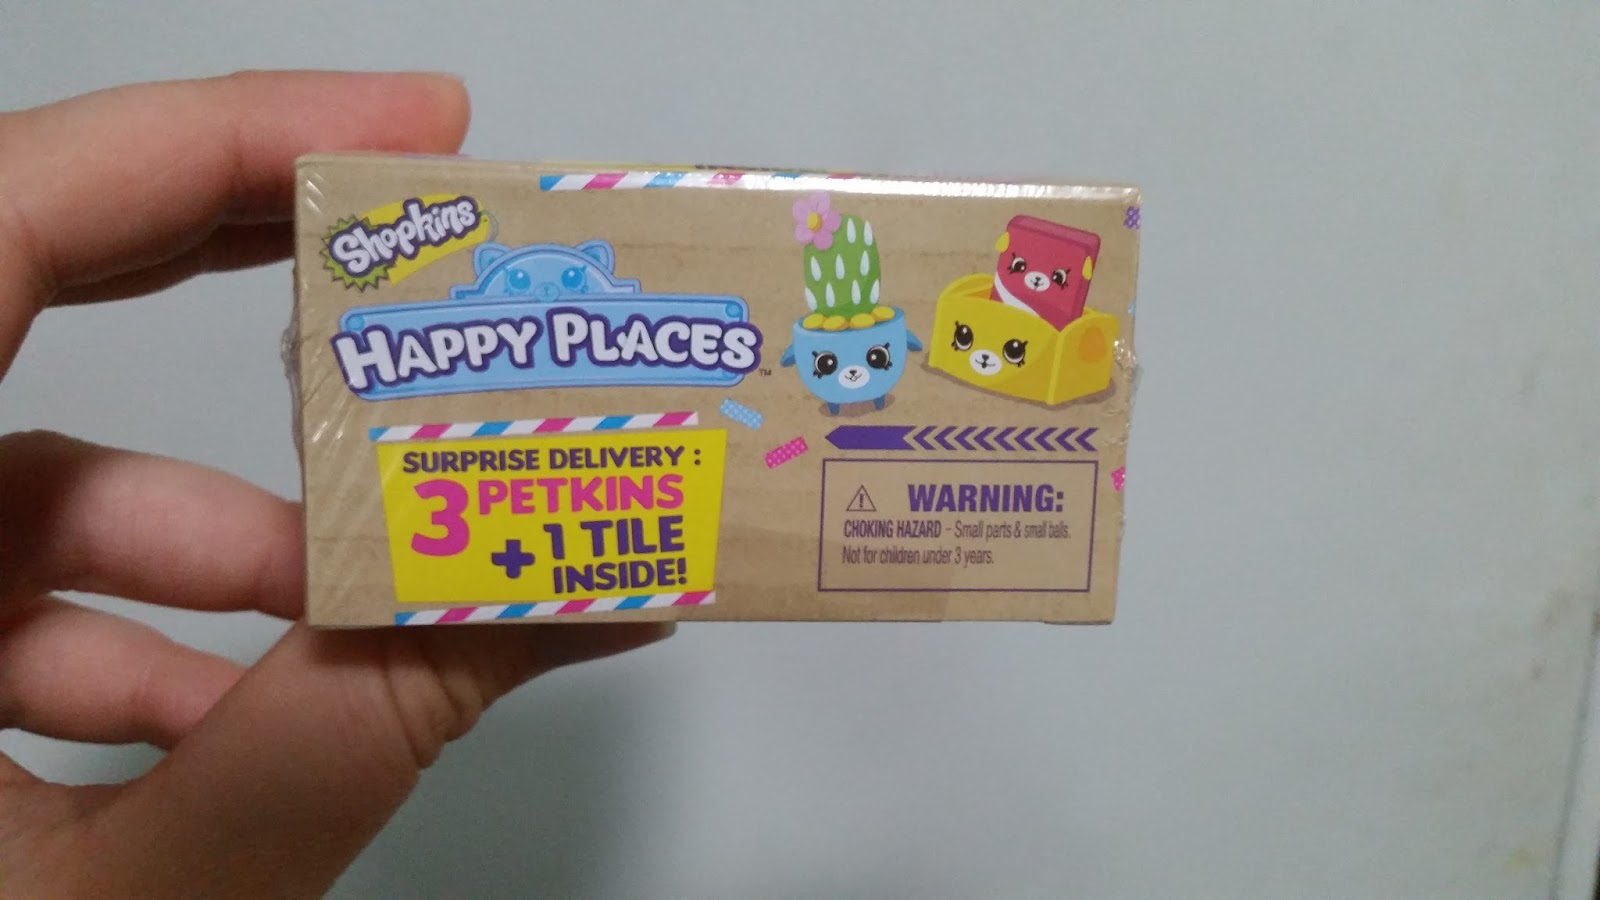 **15**SHOPKINS HAPPY PLACES LIMITED EDITION BLIND BOX SET 3 PETKINS /& 1 TILE